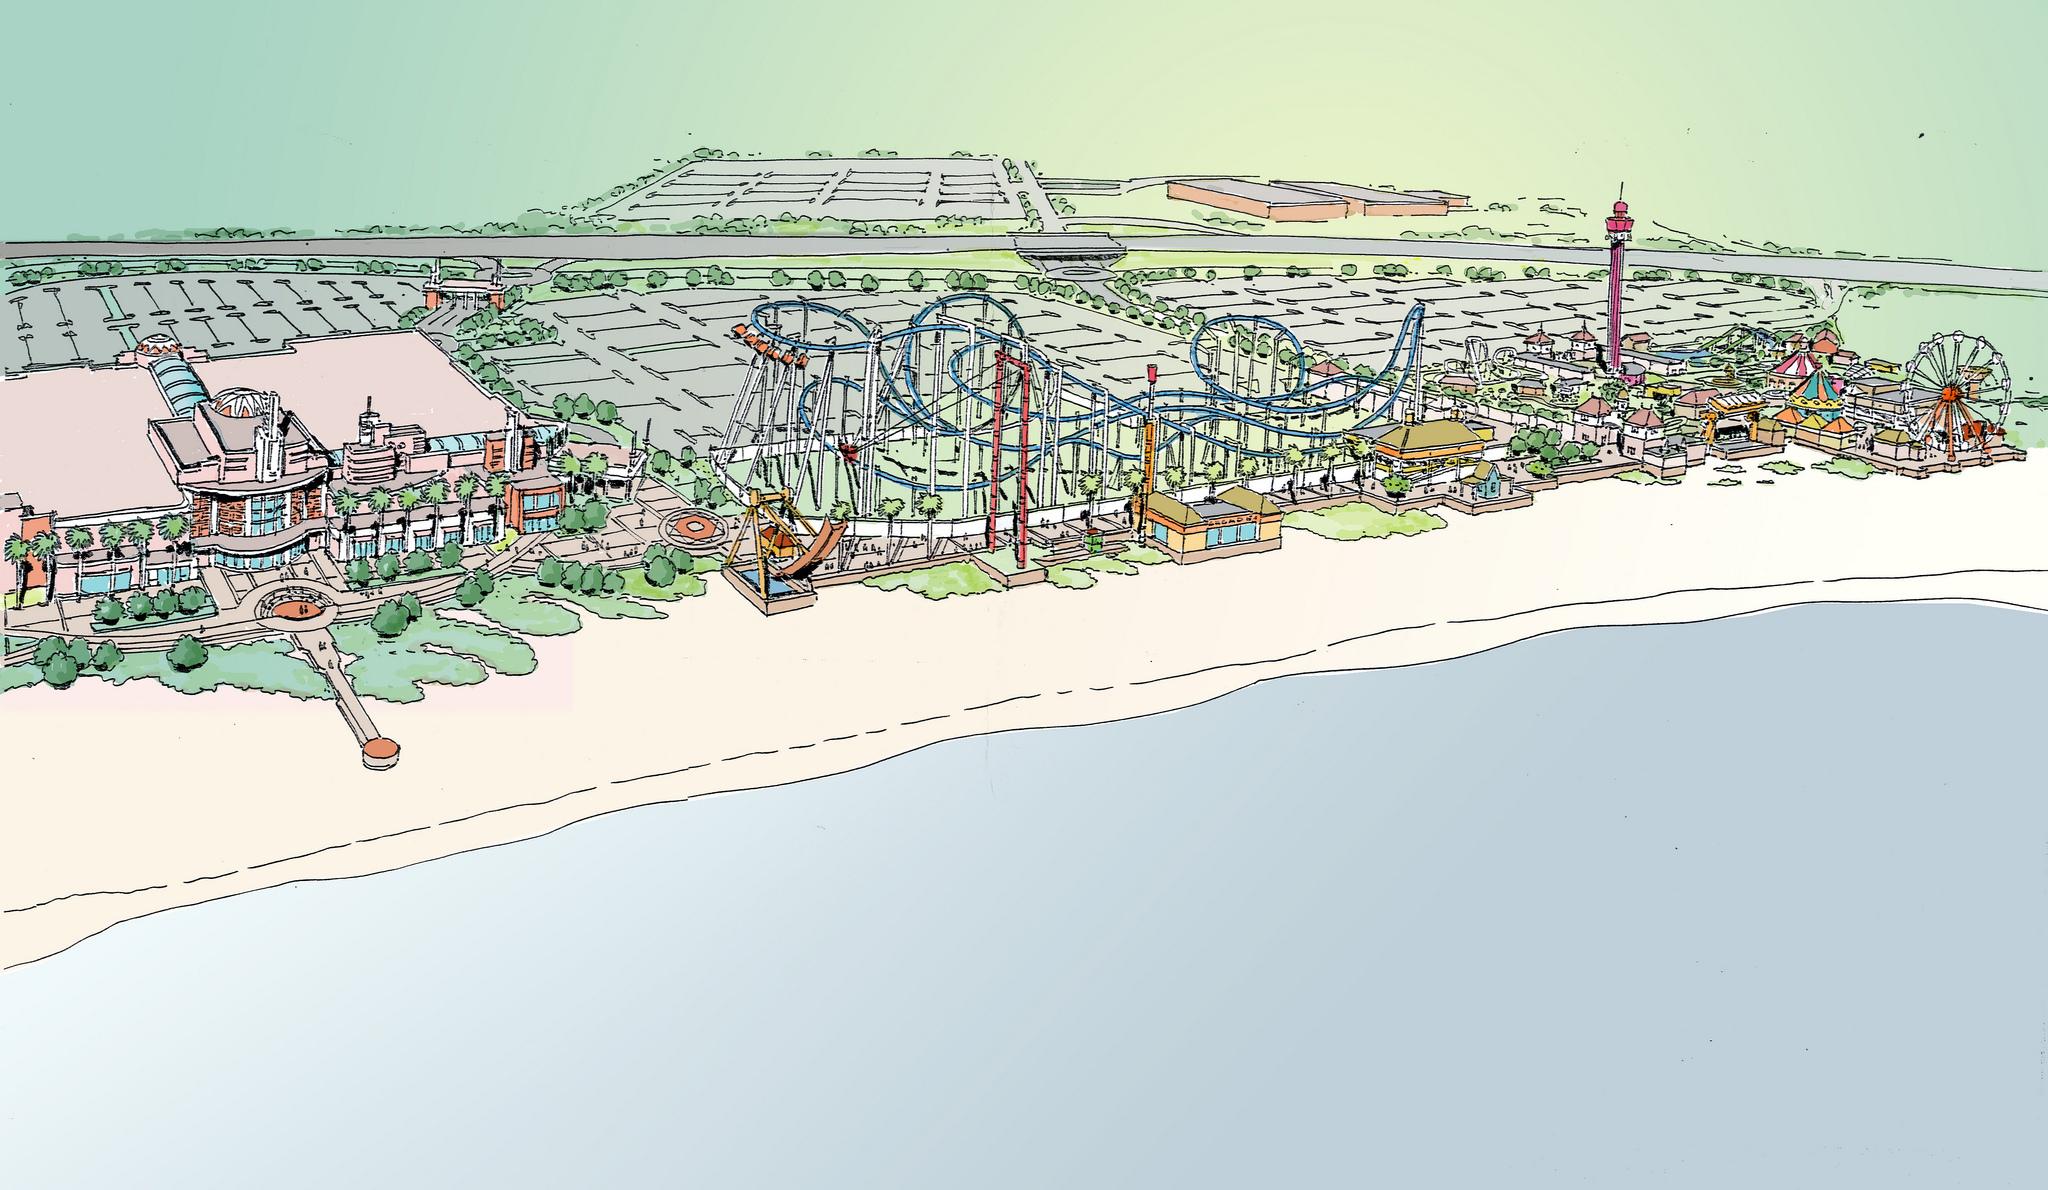 South Africa Theme Park